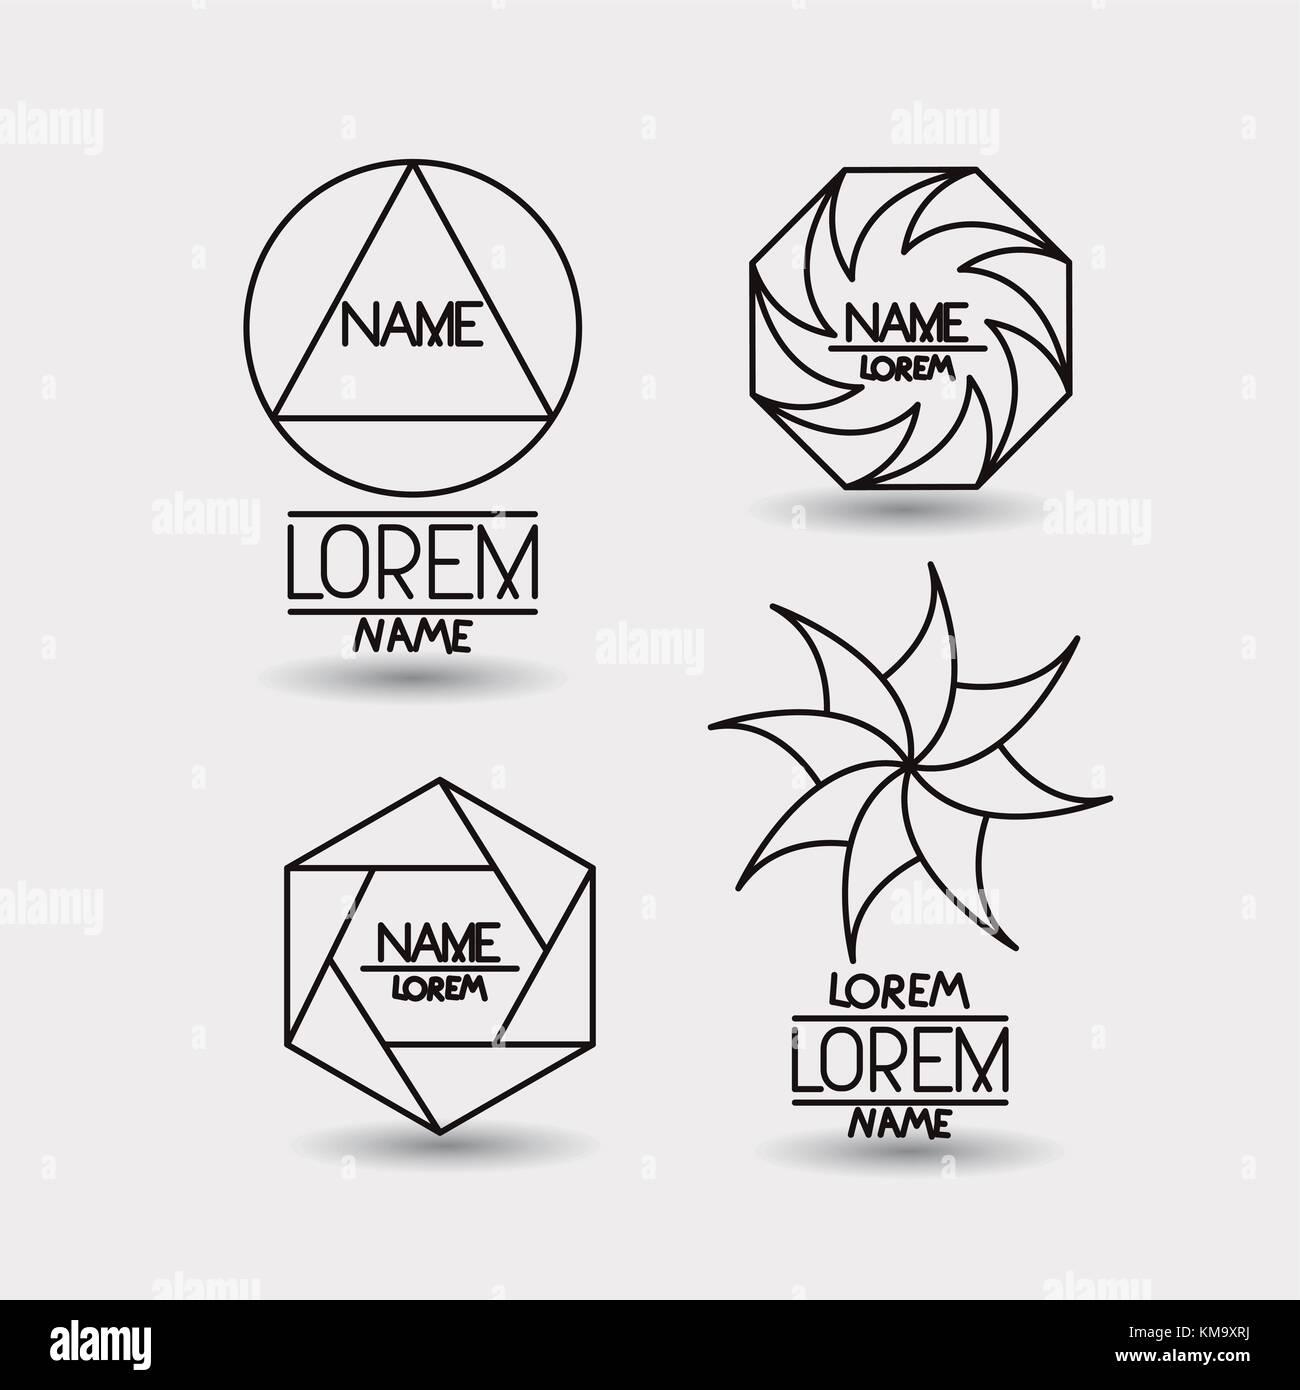 Logo Symbols Stock Photos Logo Symbols Stock Images Alamy